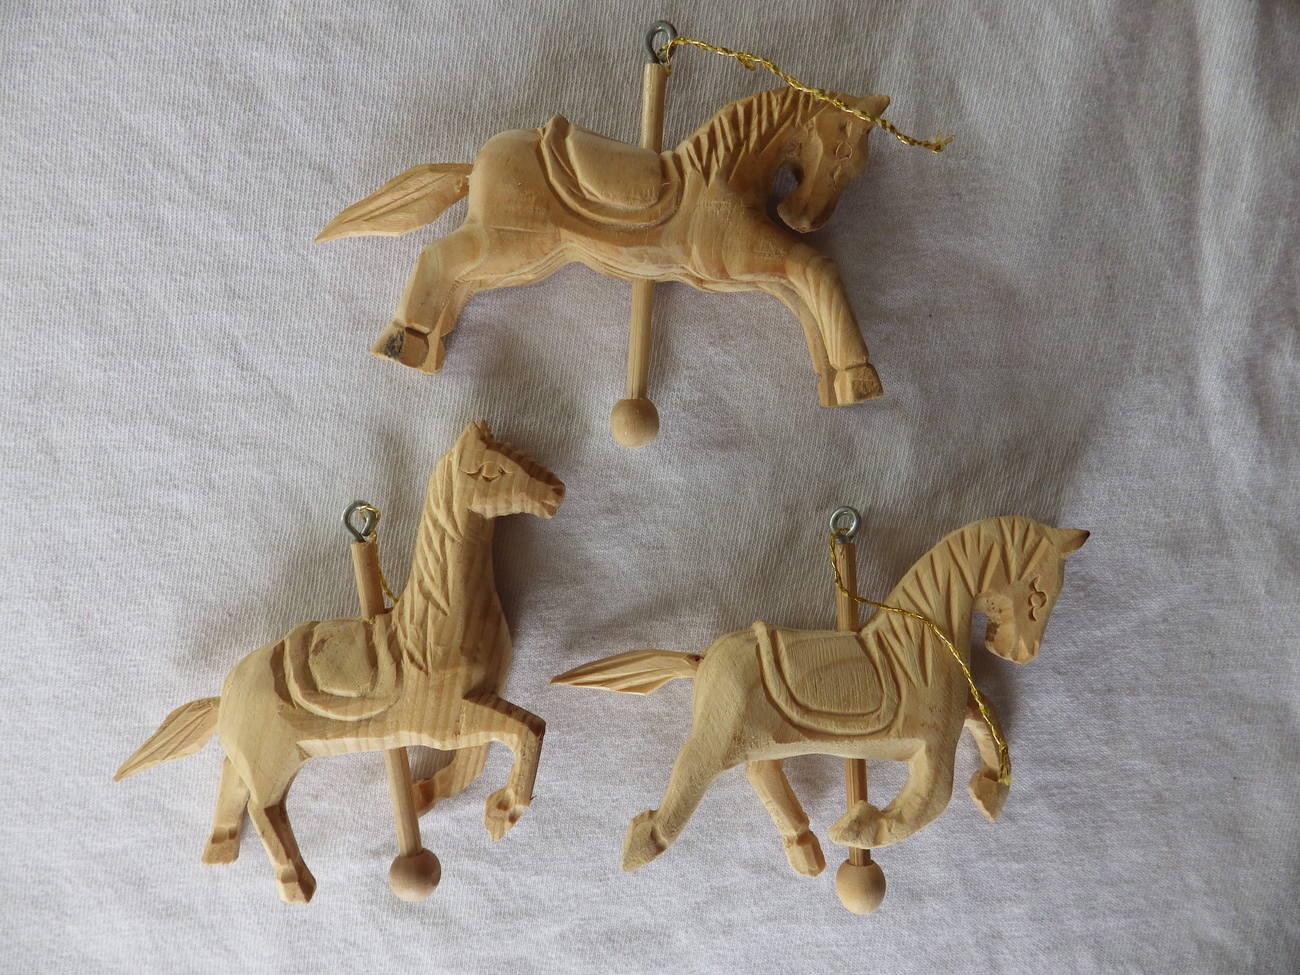 3 Wooden Carousel Horse Christmas Ornaments - Horses